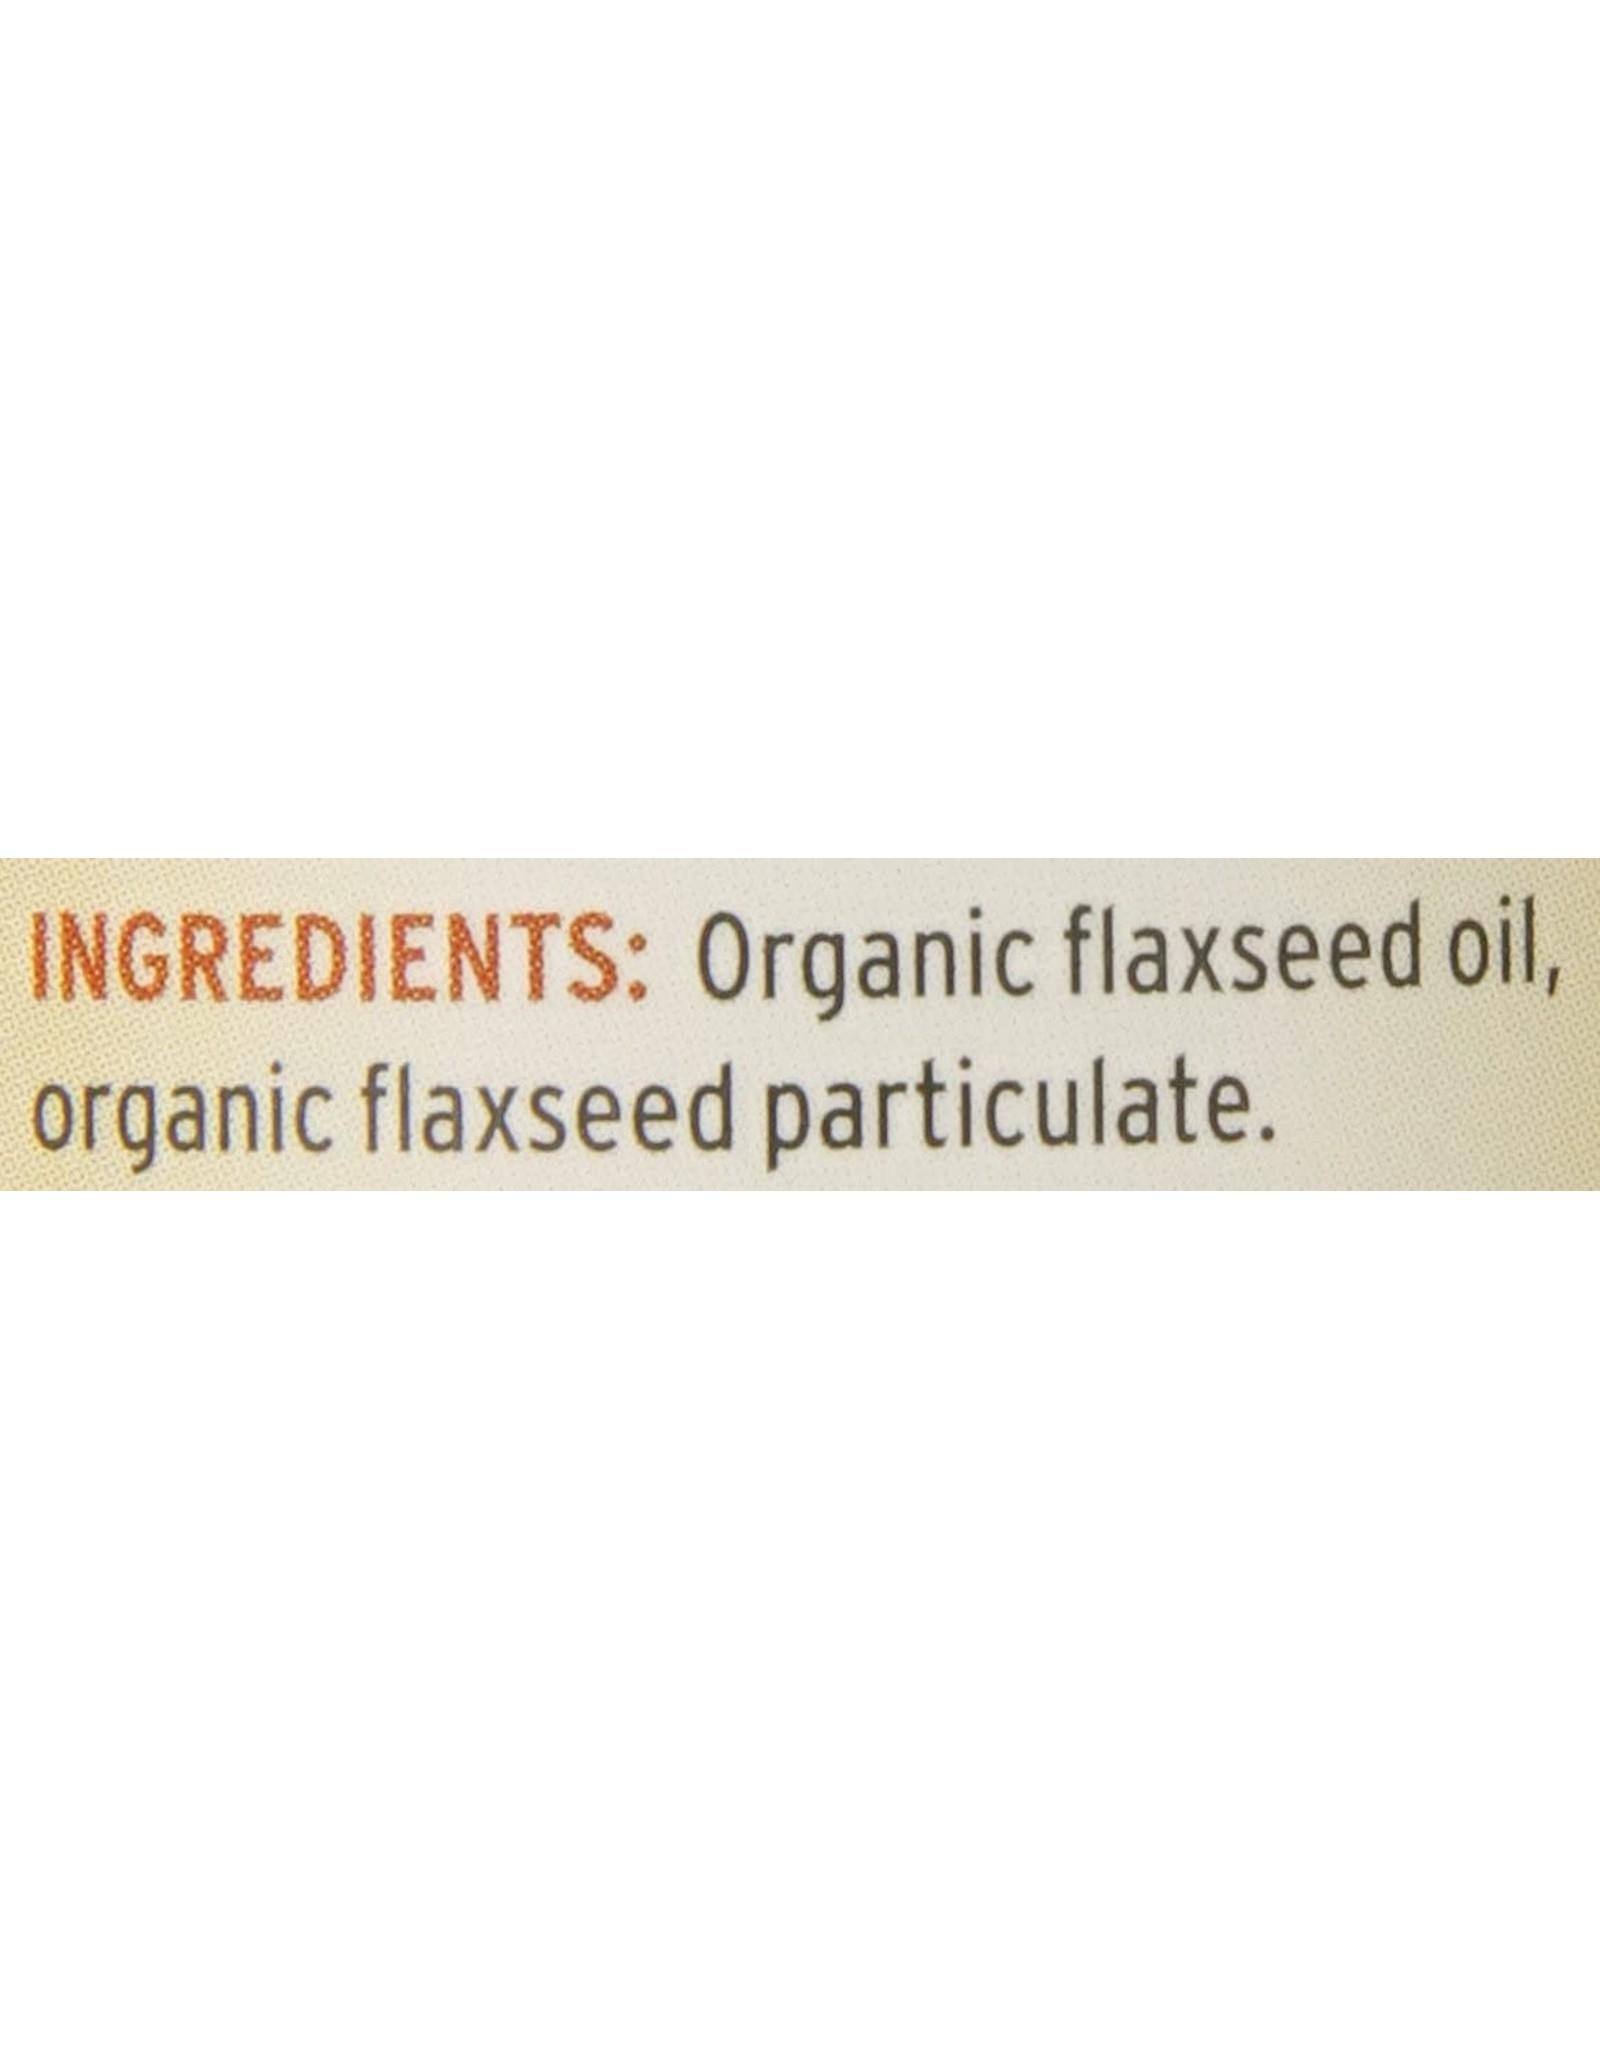 Barleans Organic Lignan Flax Oil 12oz